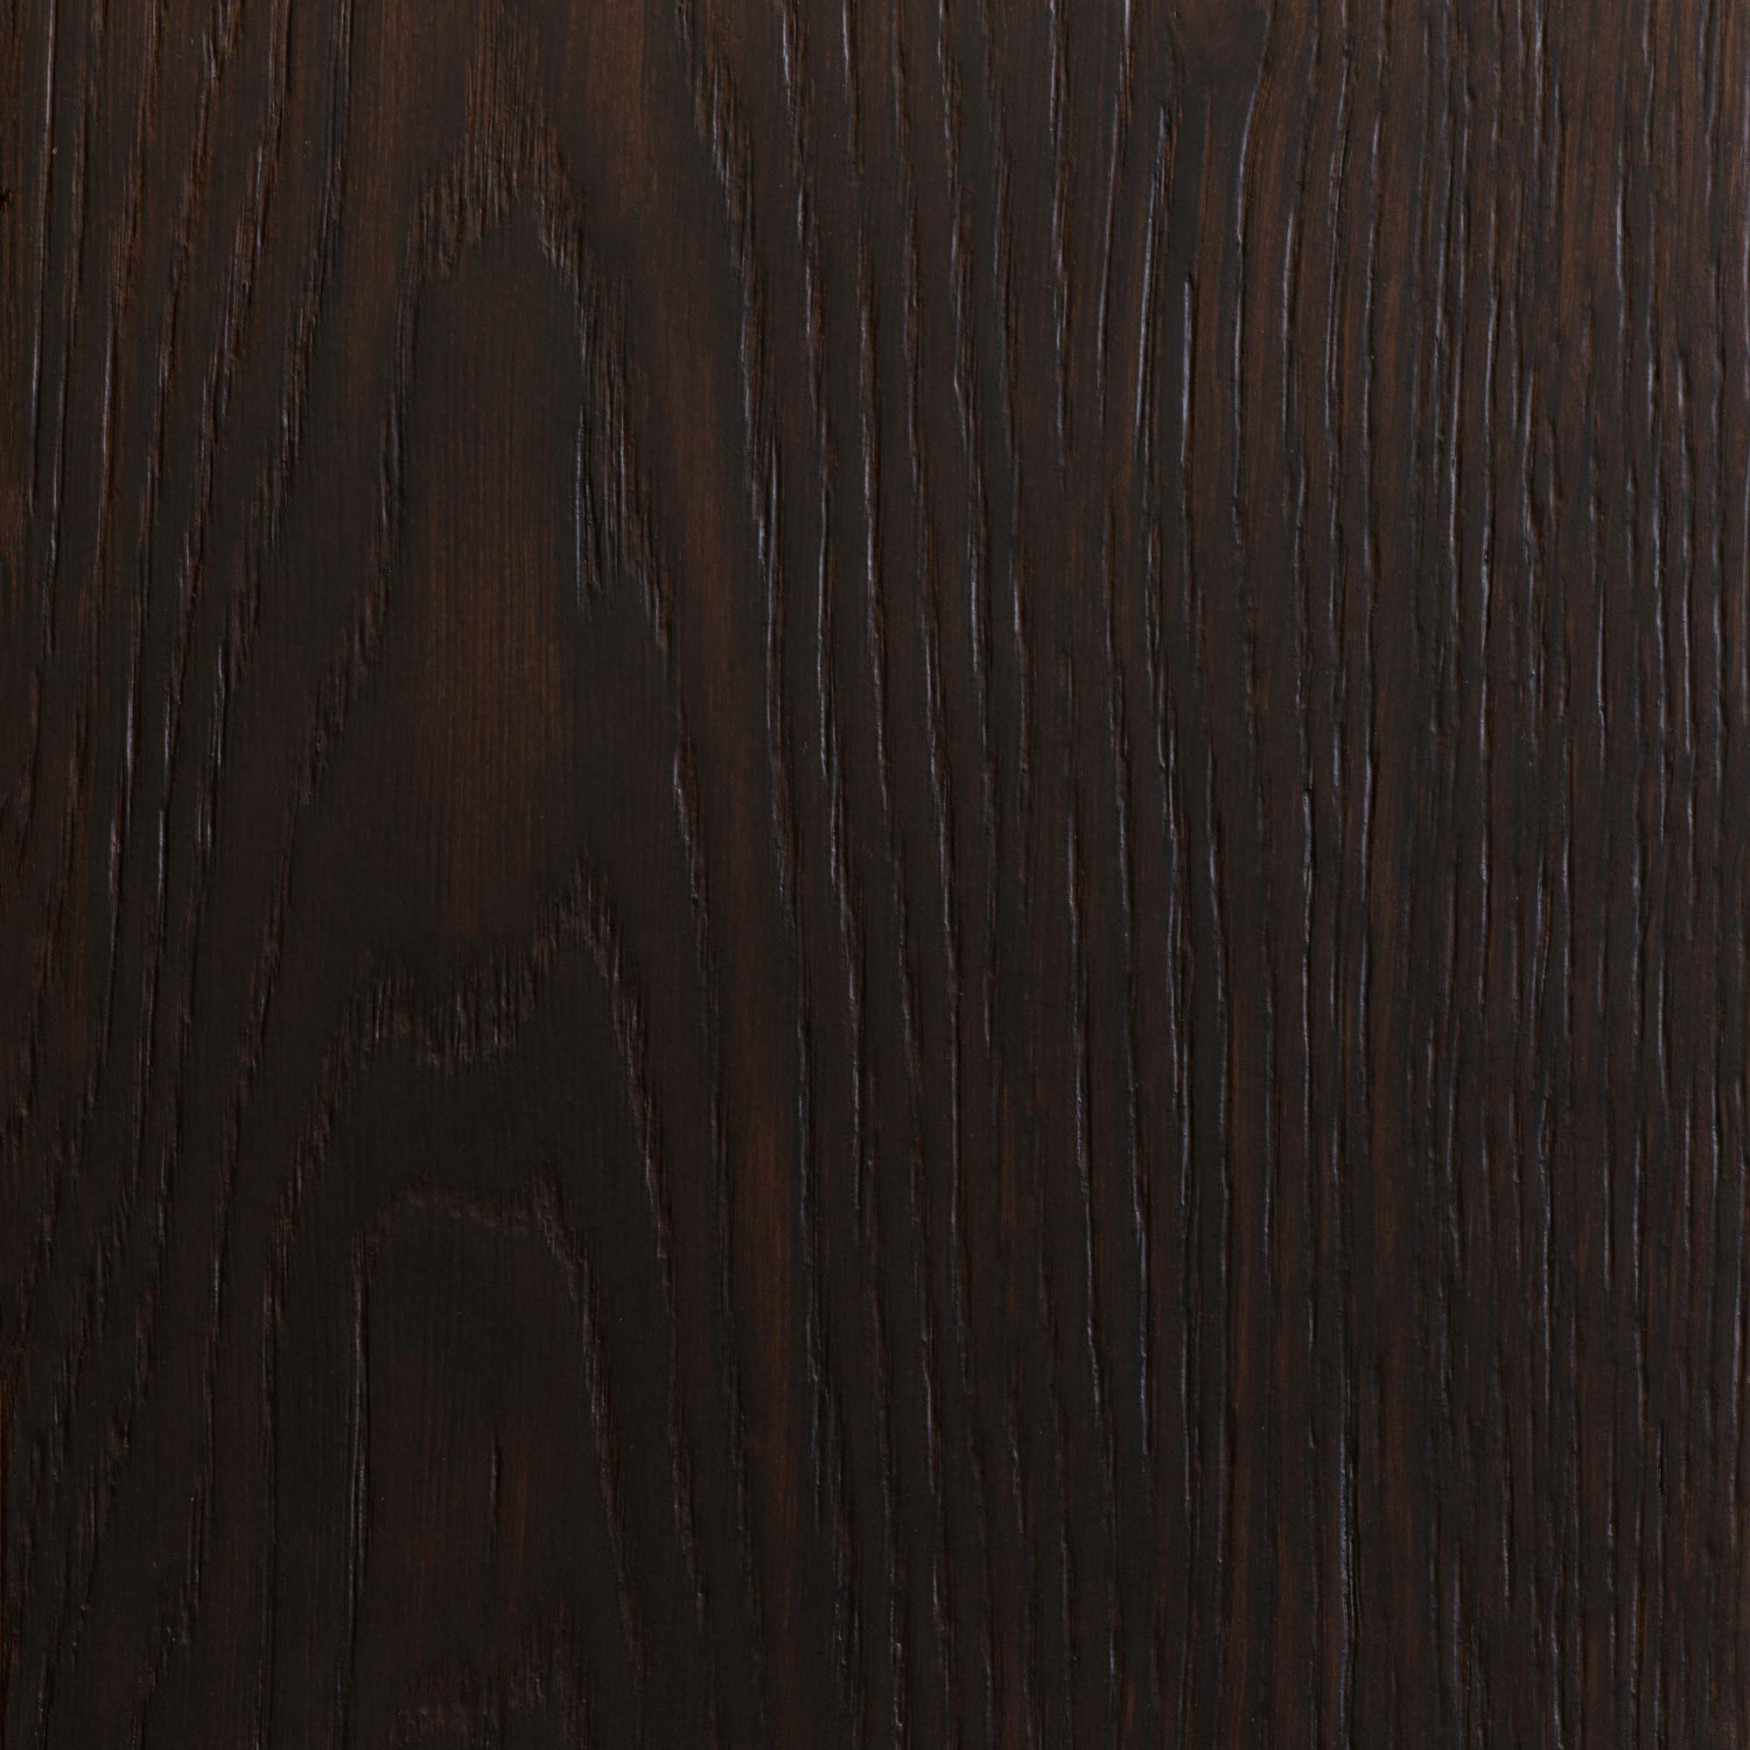 Element7-wide-plank-samples-C-11